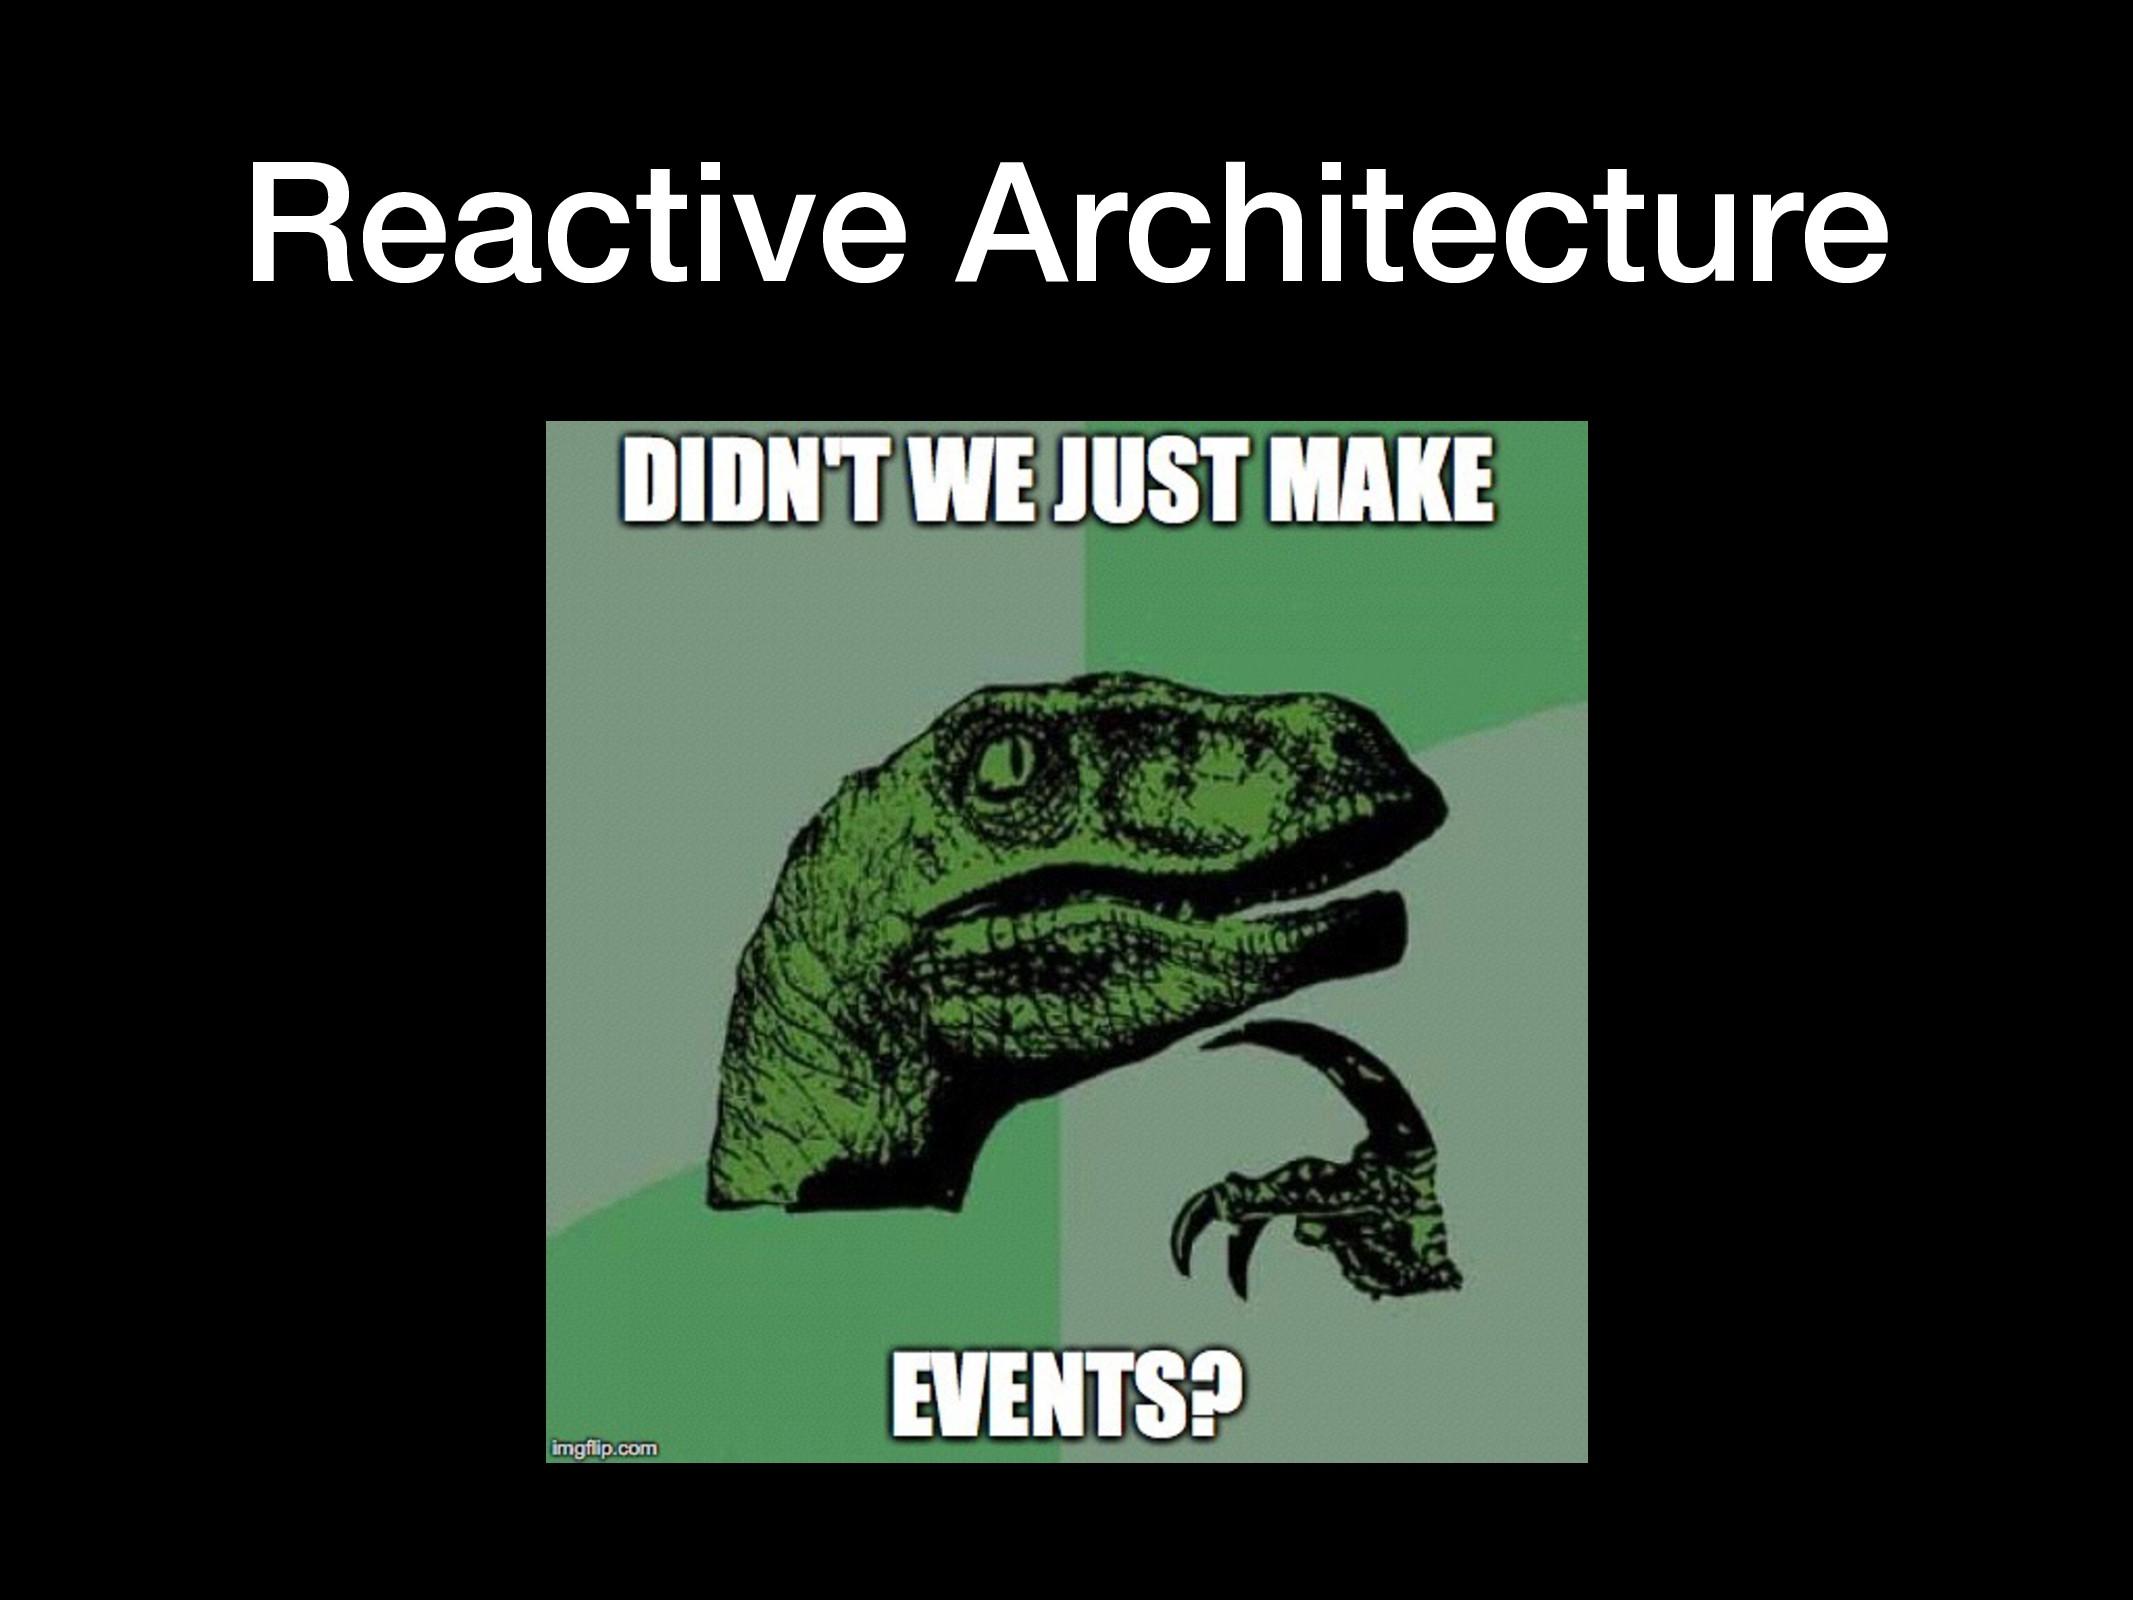 Reactive Architecture